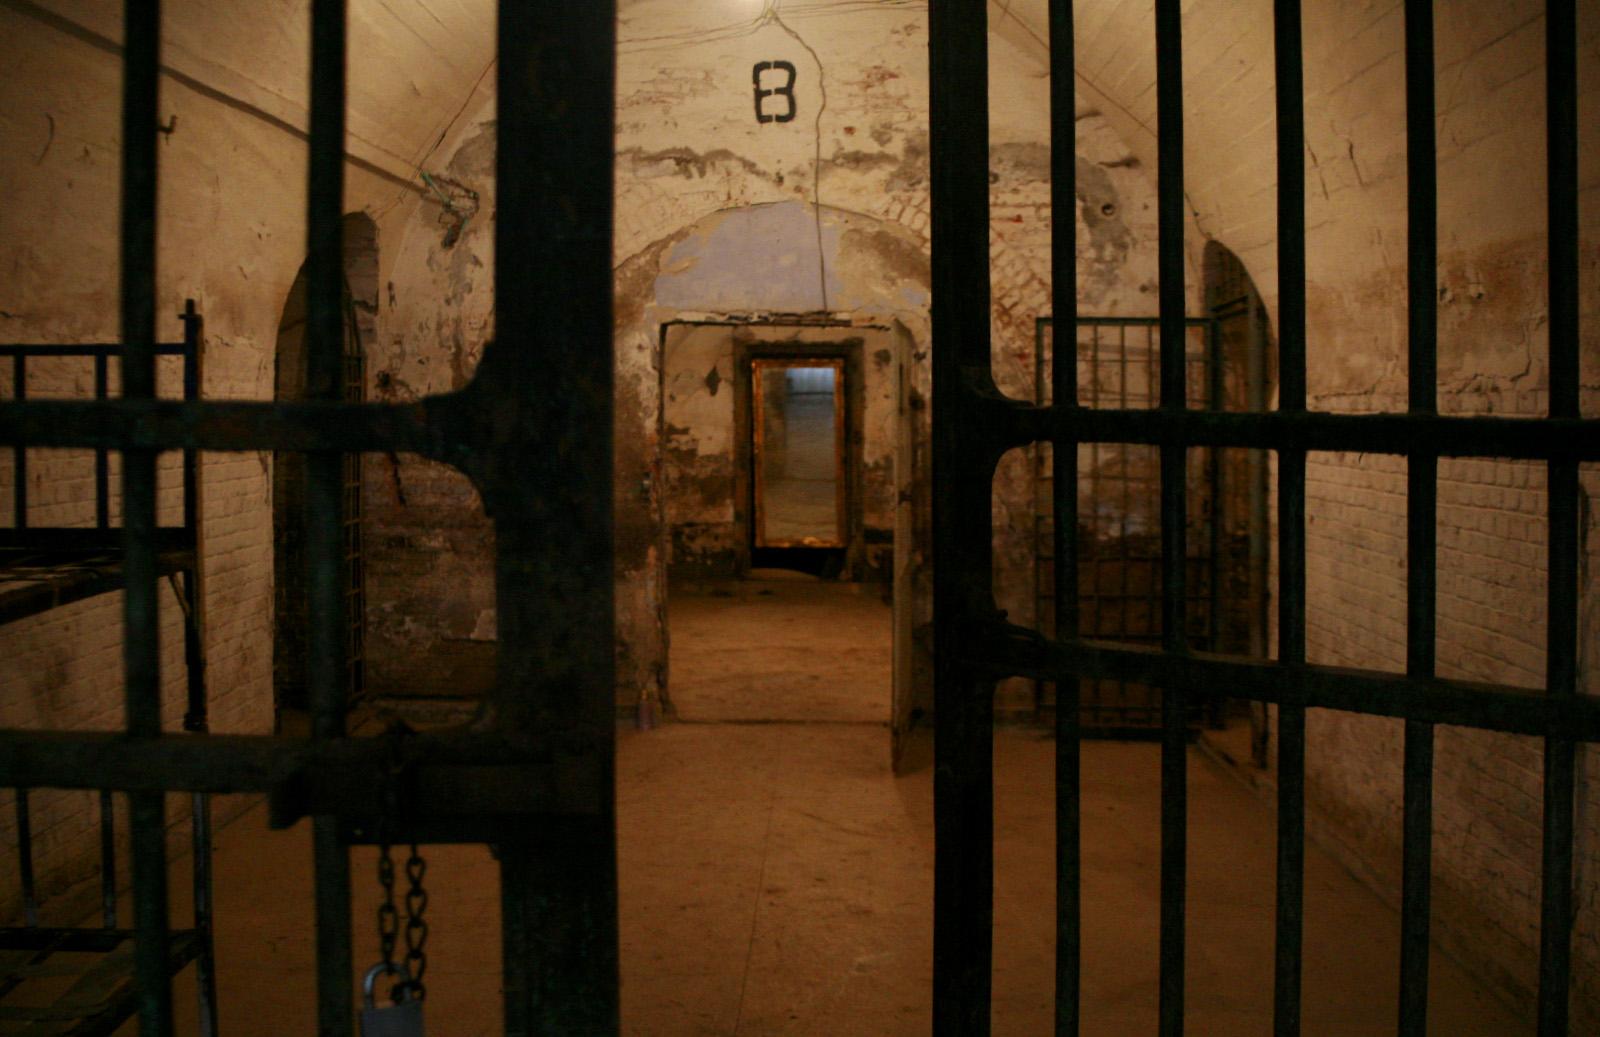 Jilava prison